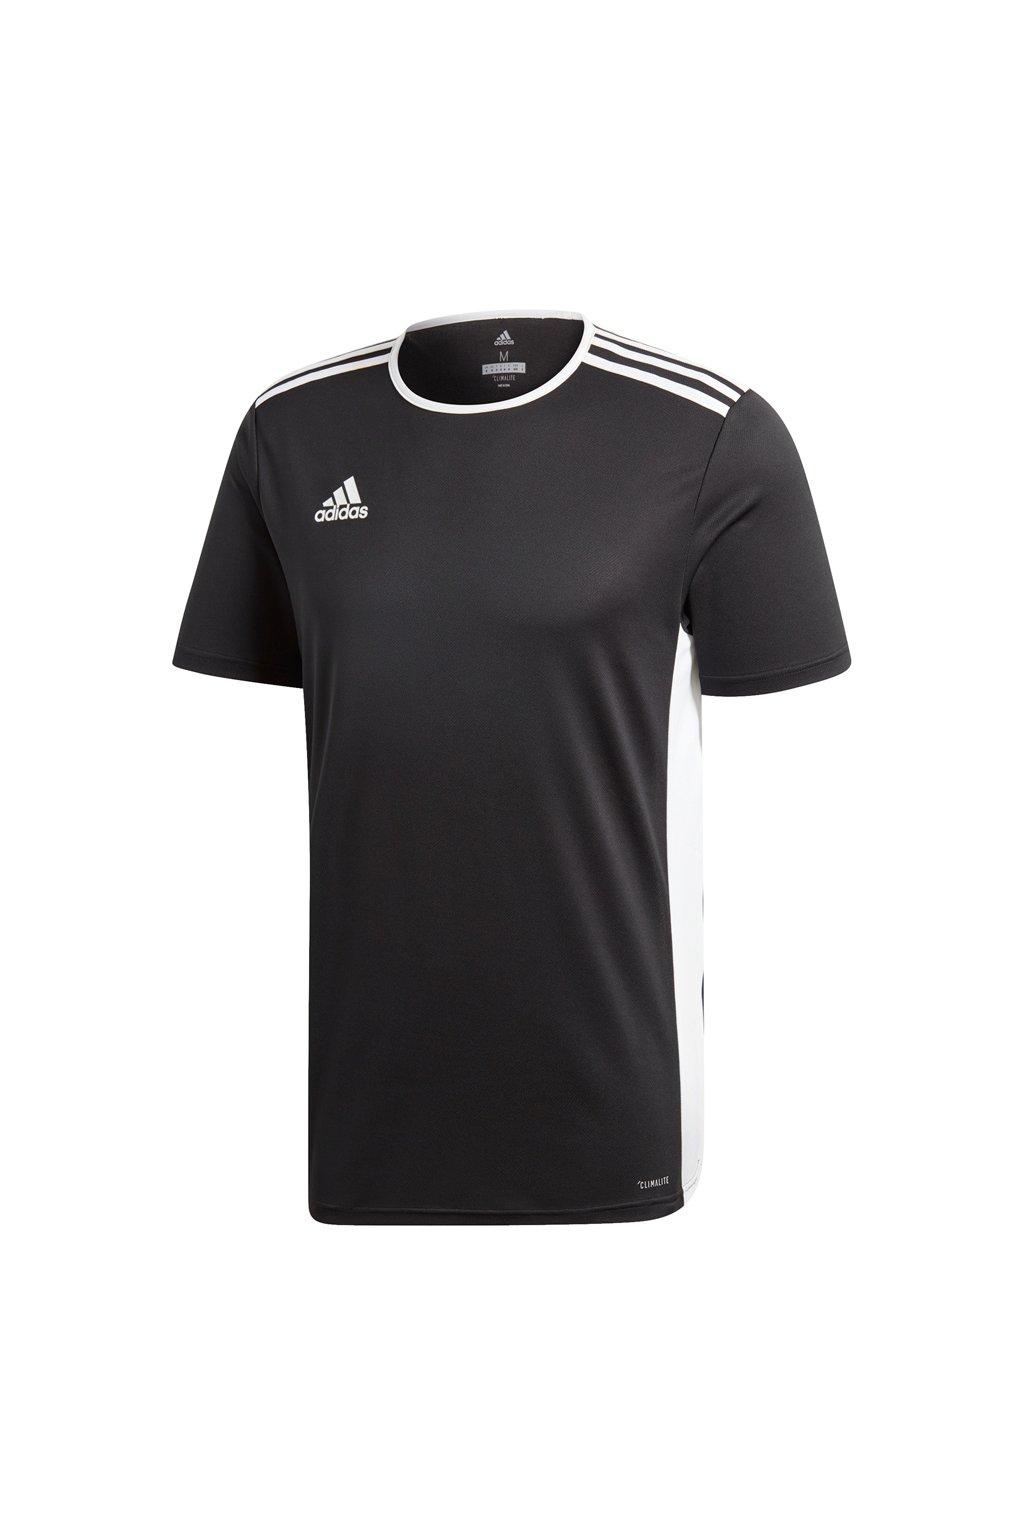 Adidas Entrada 18 Jersey pánske tričko čierne CF1035